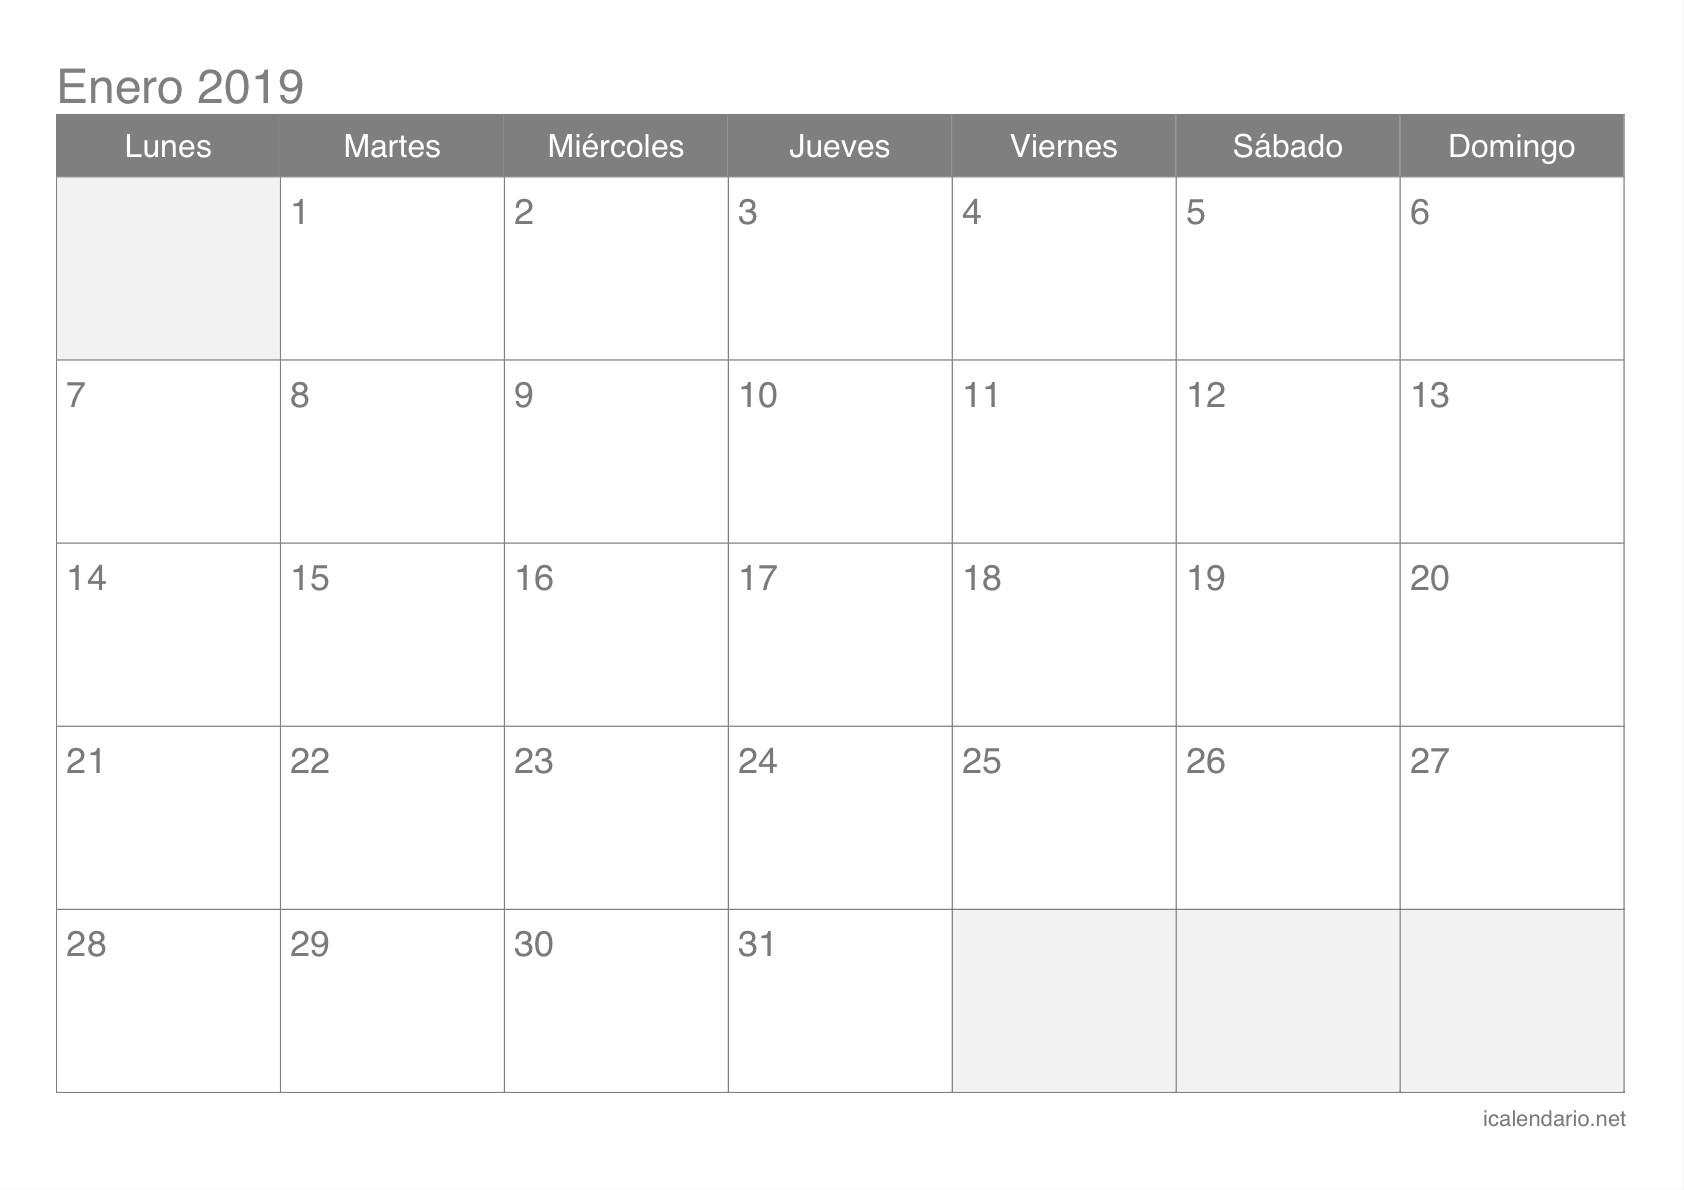 Calendario Diciembre 2019 Argentina Recientes Calendario Escolar 2018 2019 Más De 100 Plantillas E Imágenes Para